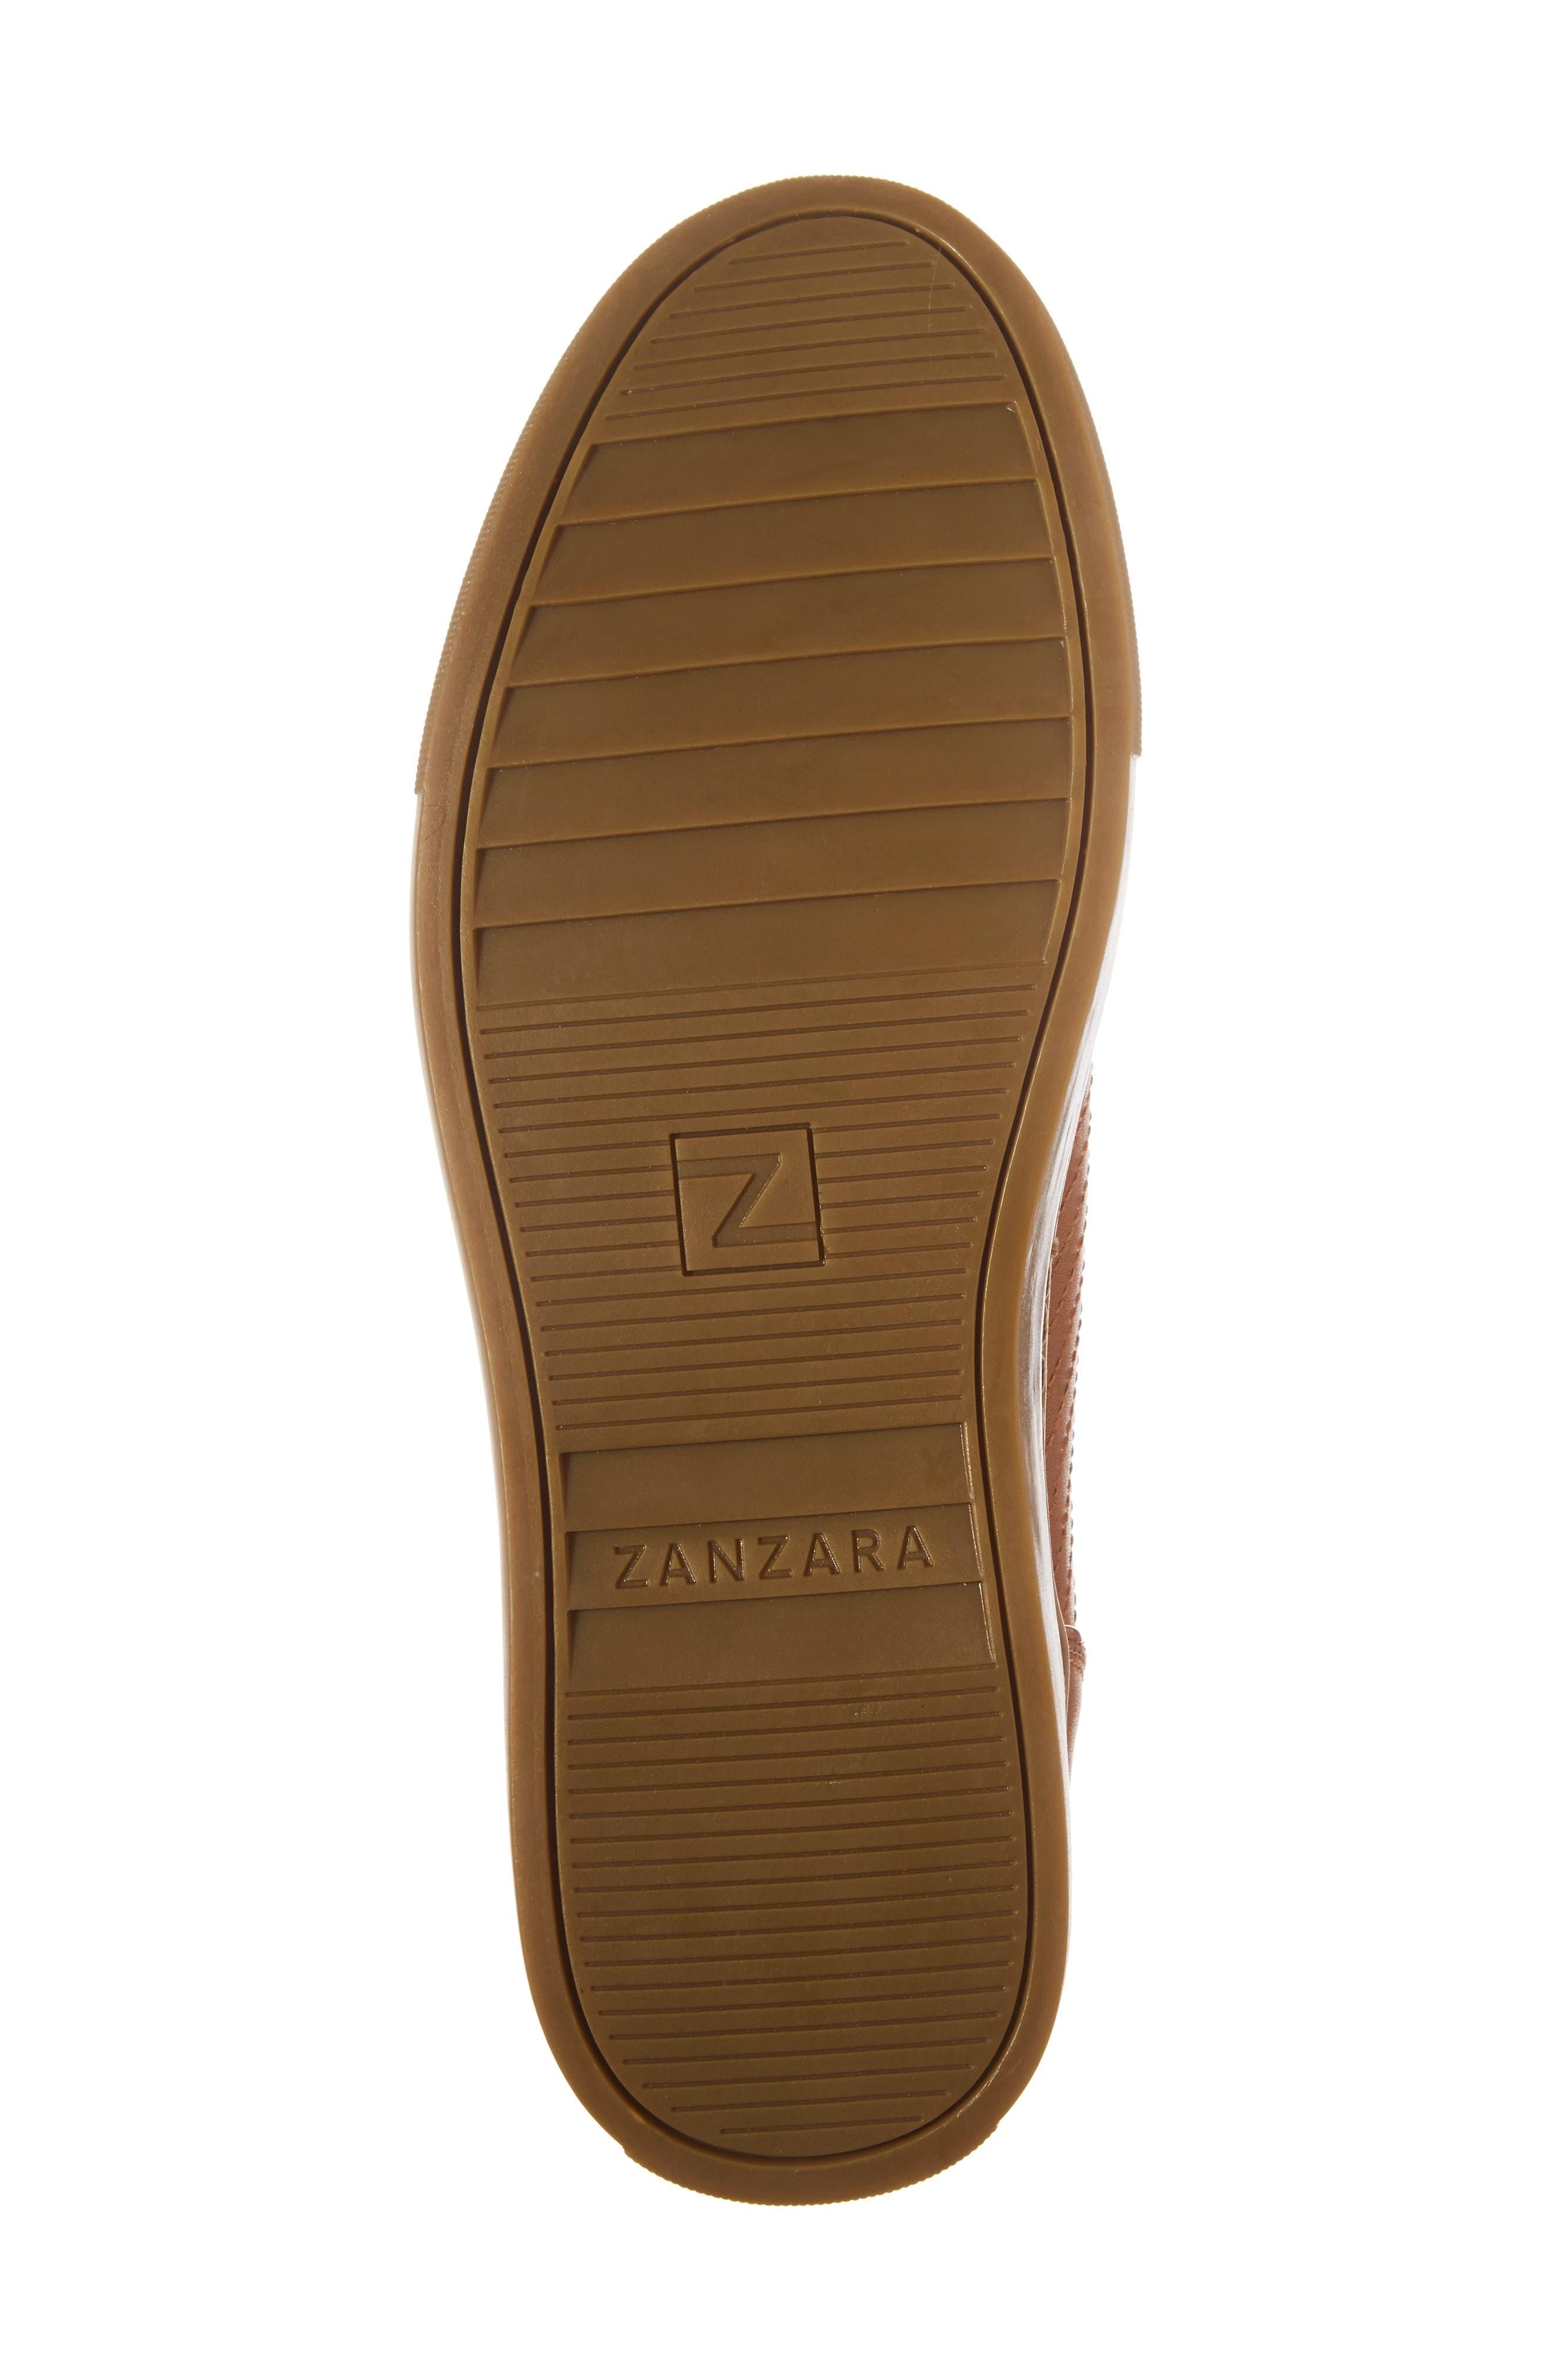 Youse Sneaker,                             Alternate thumbnail 6, color,                             Cognac Leather